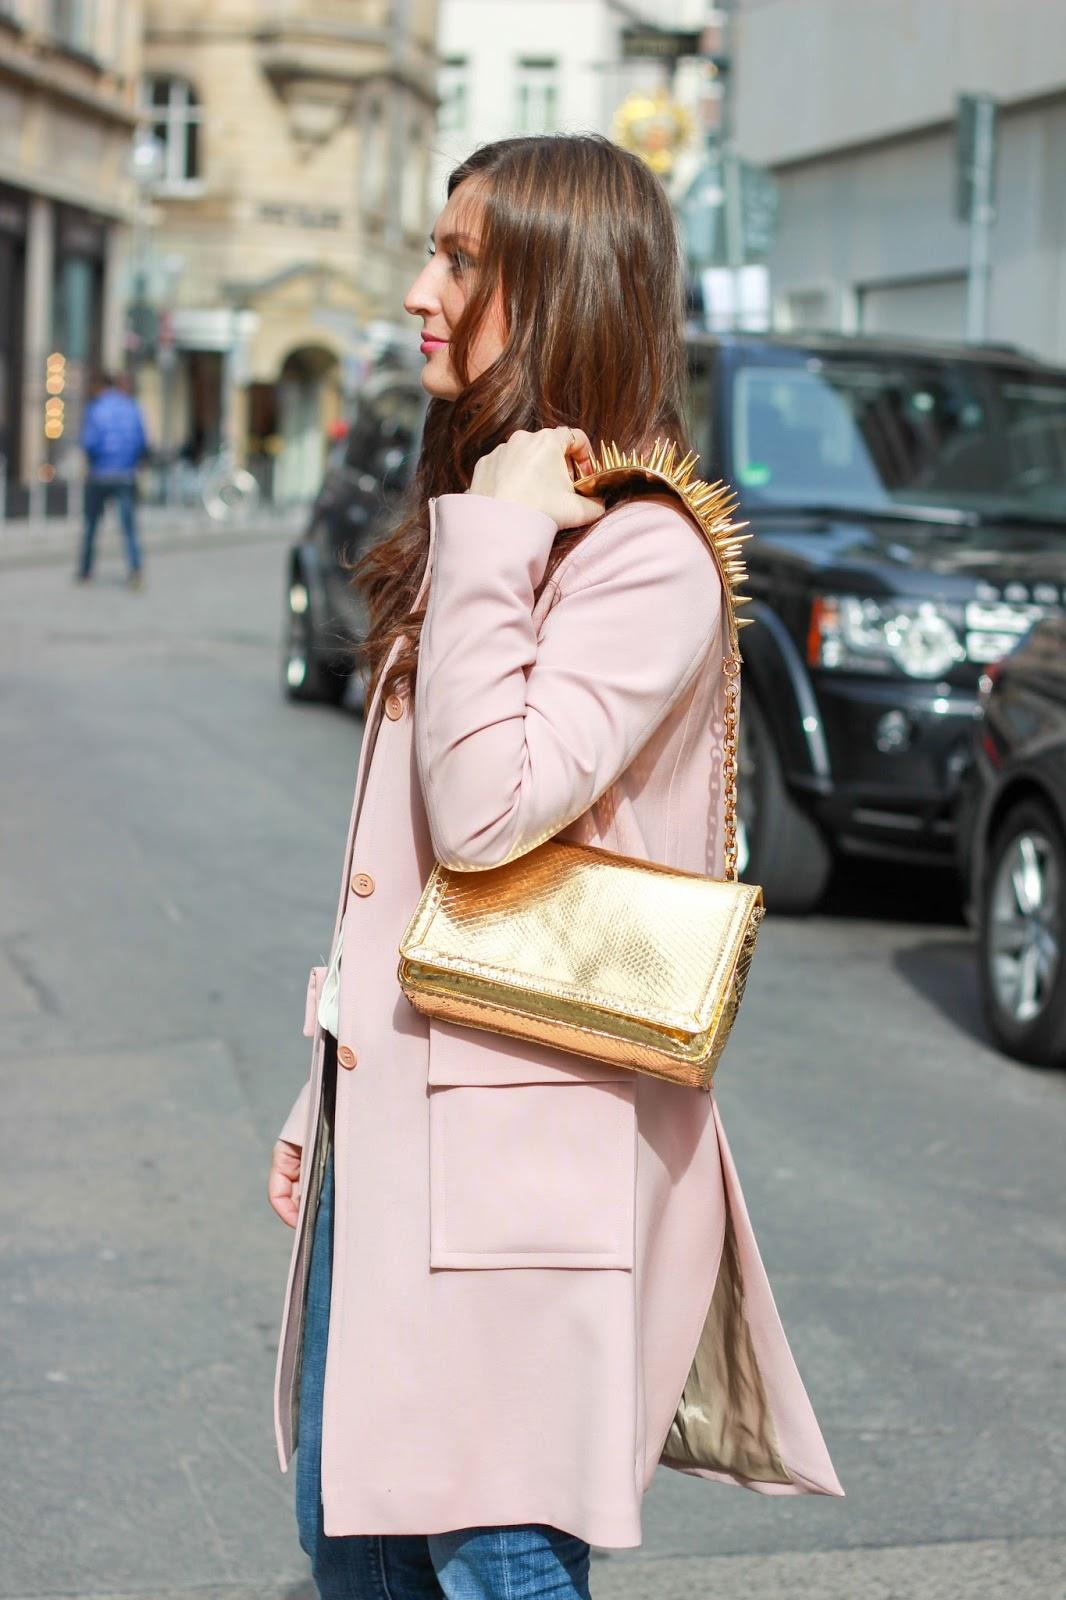 Frankfurt Fashionblogger - Fashionblogger aus Frankfurt -German Fashionblogger - Streetstyle Look - Streetstyleinspiration